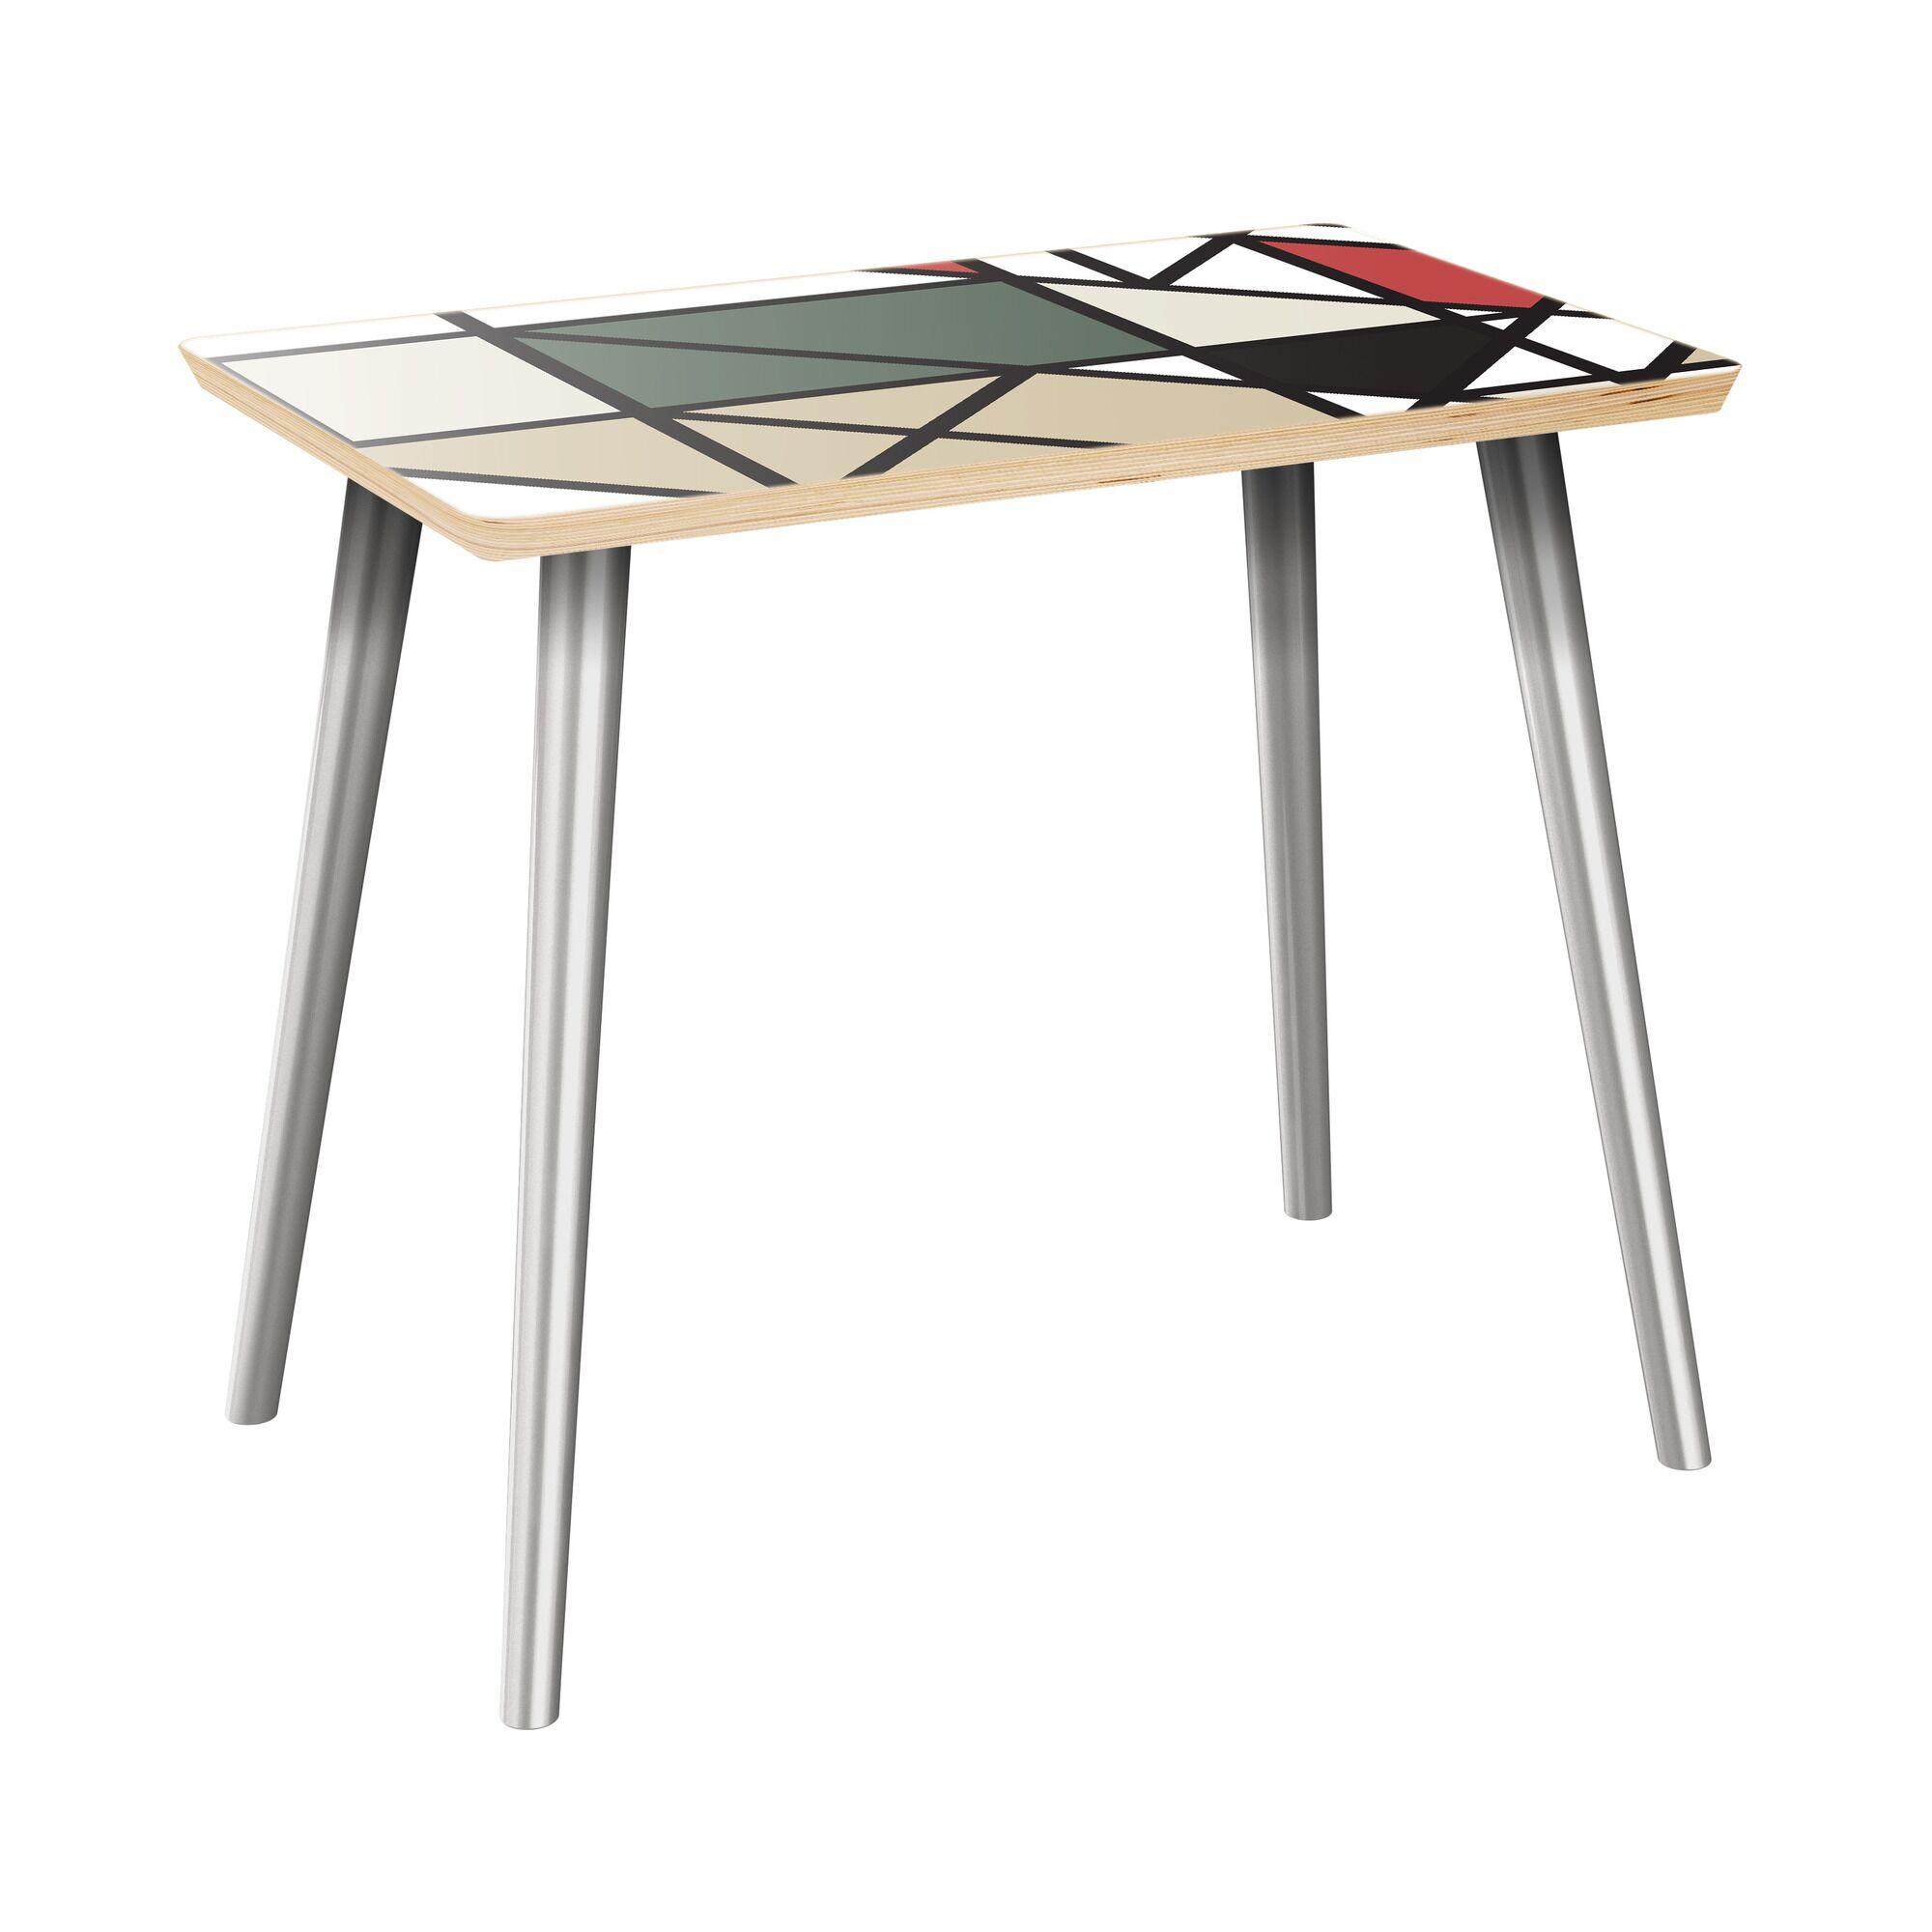 Ilasha End Table Table Top Color: Natural, Table Base Color: Chrome